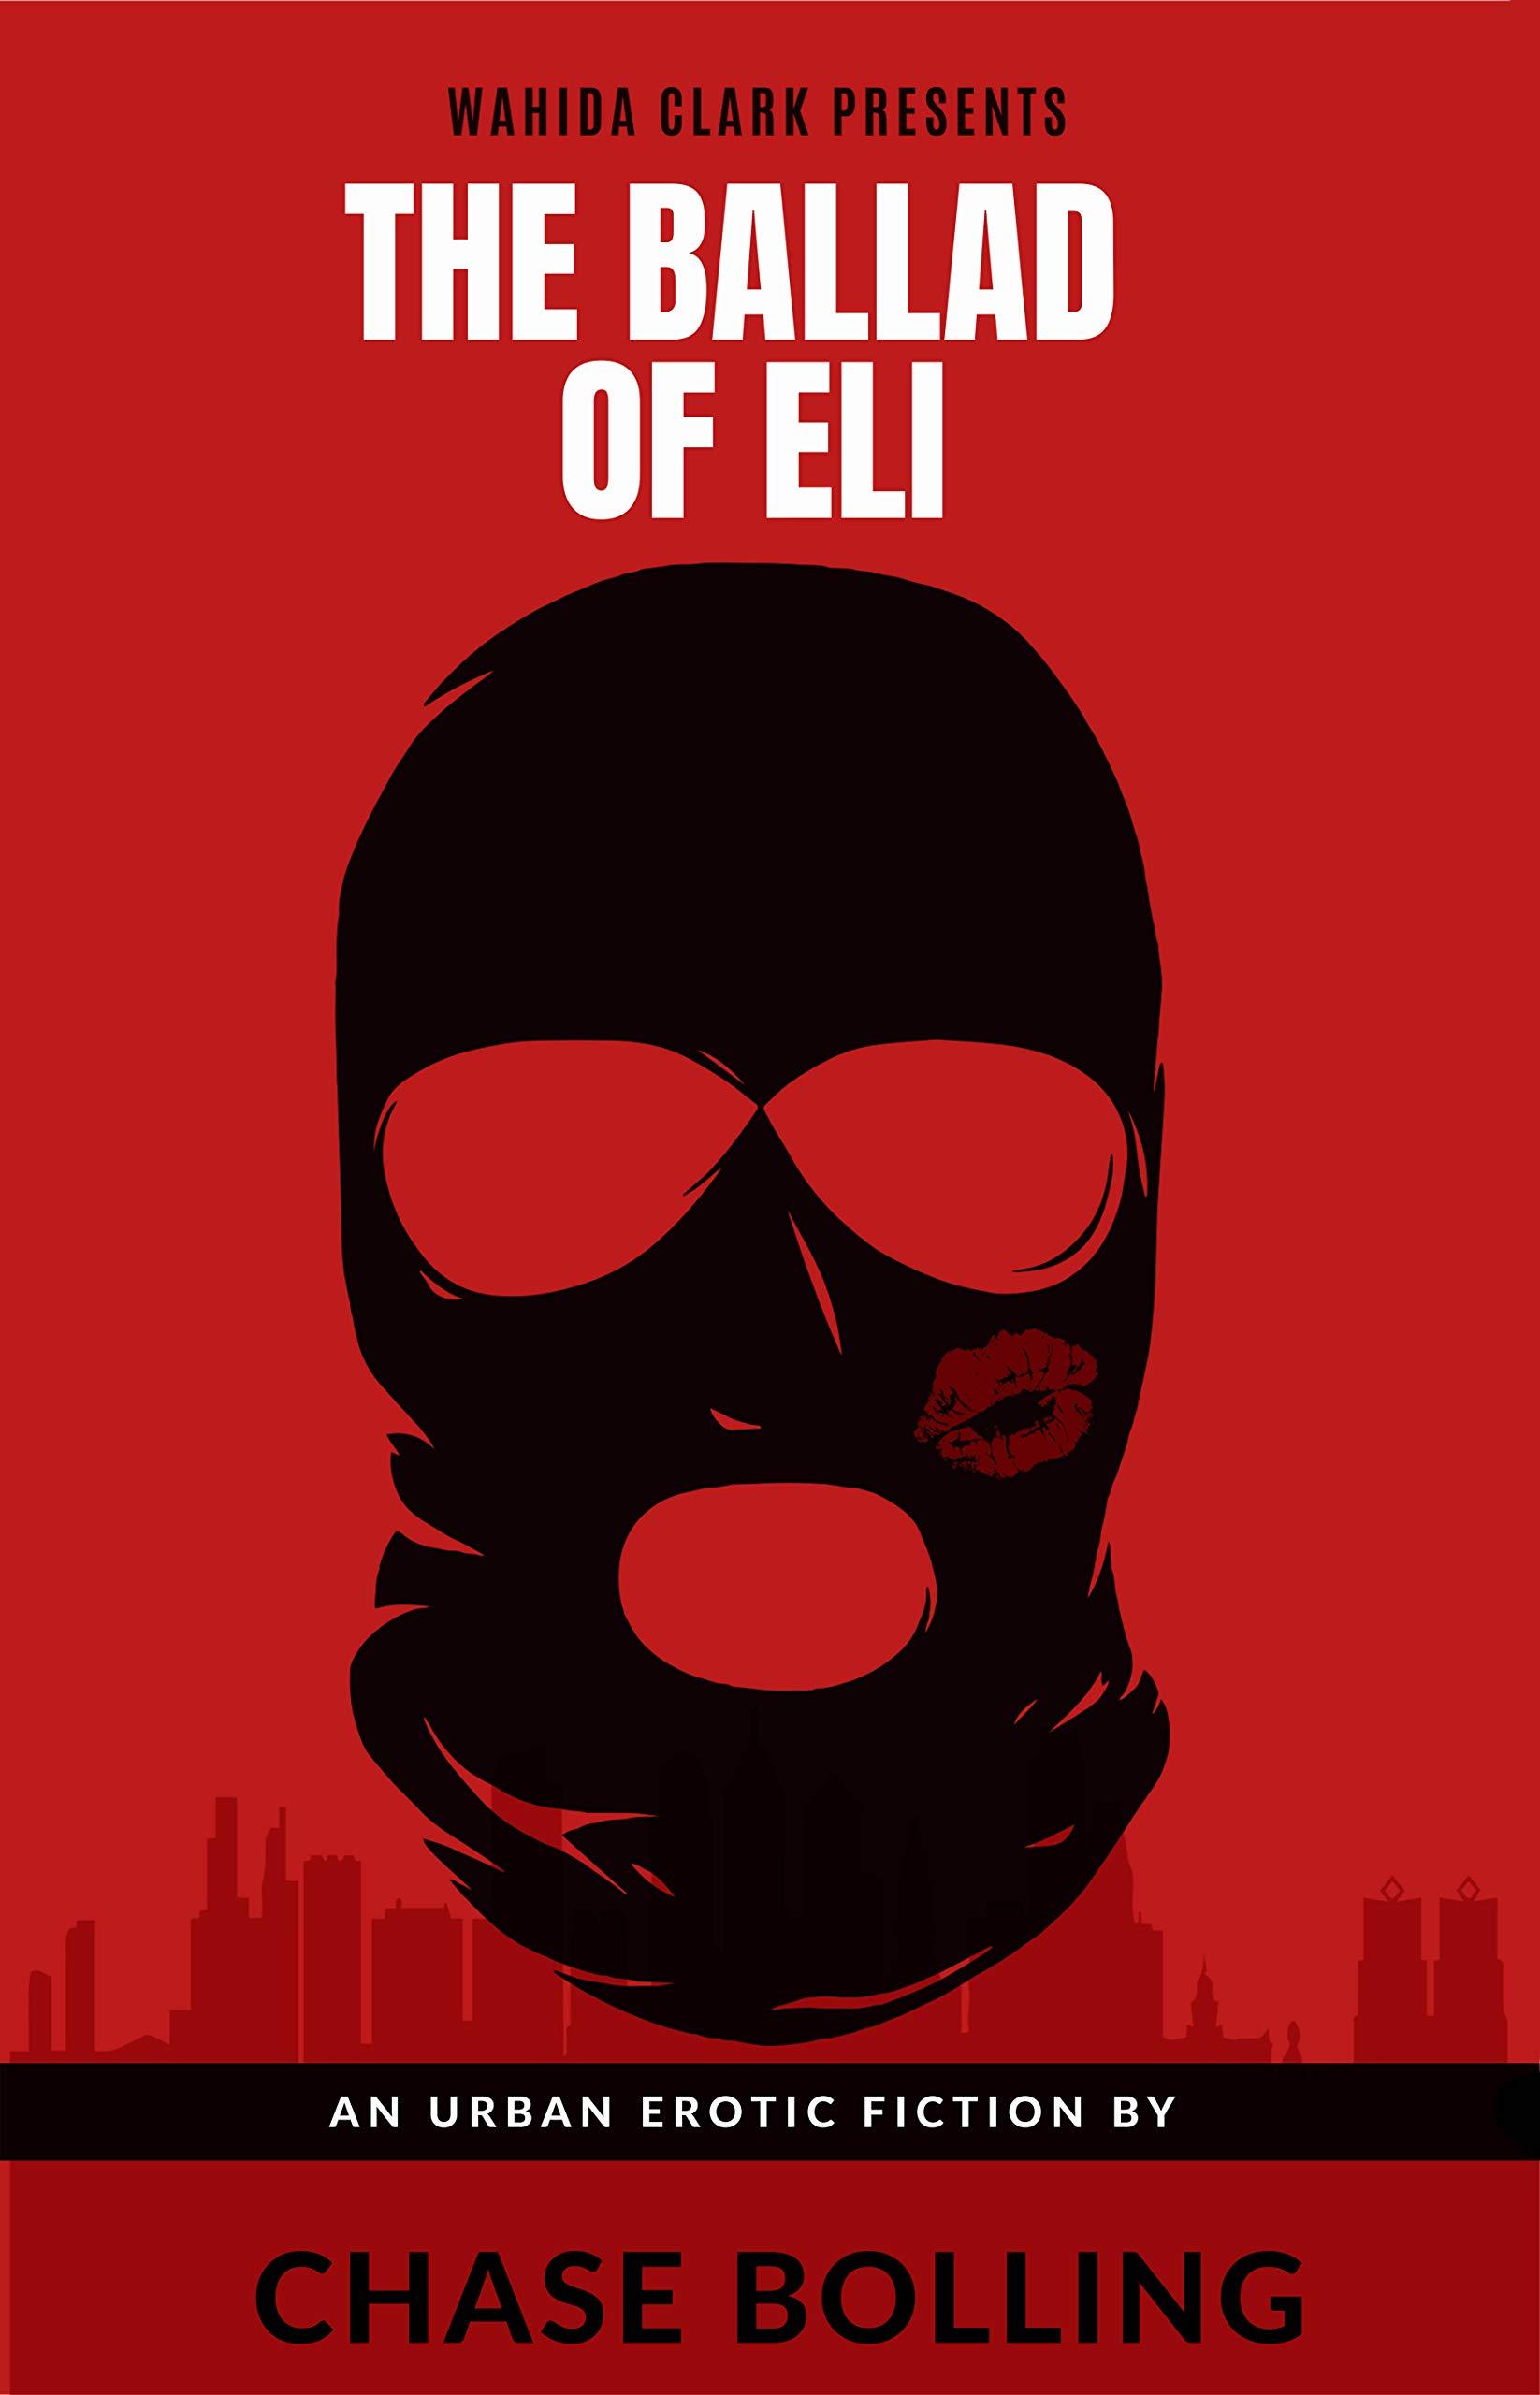 The Ballad Of Eli: An Erotic Urban Fiction